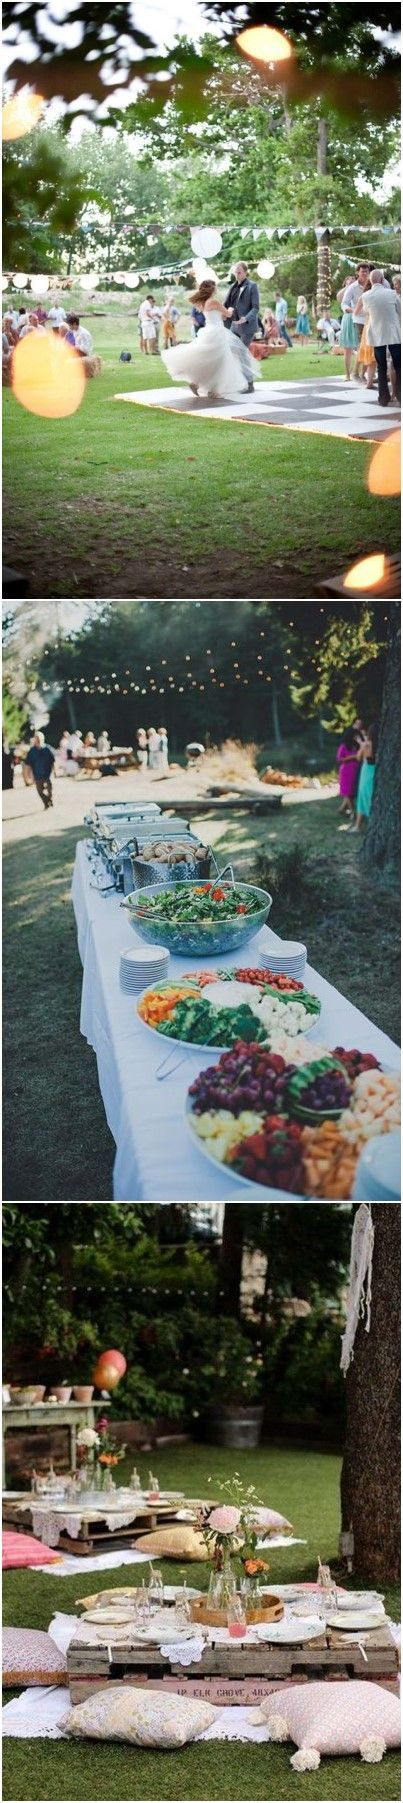 wedding reception dinner ideas on budget%0A    Budget Friendly Picnic Wedding Reception Ideas